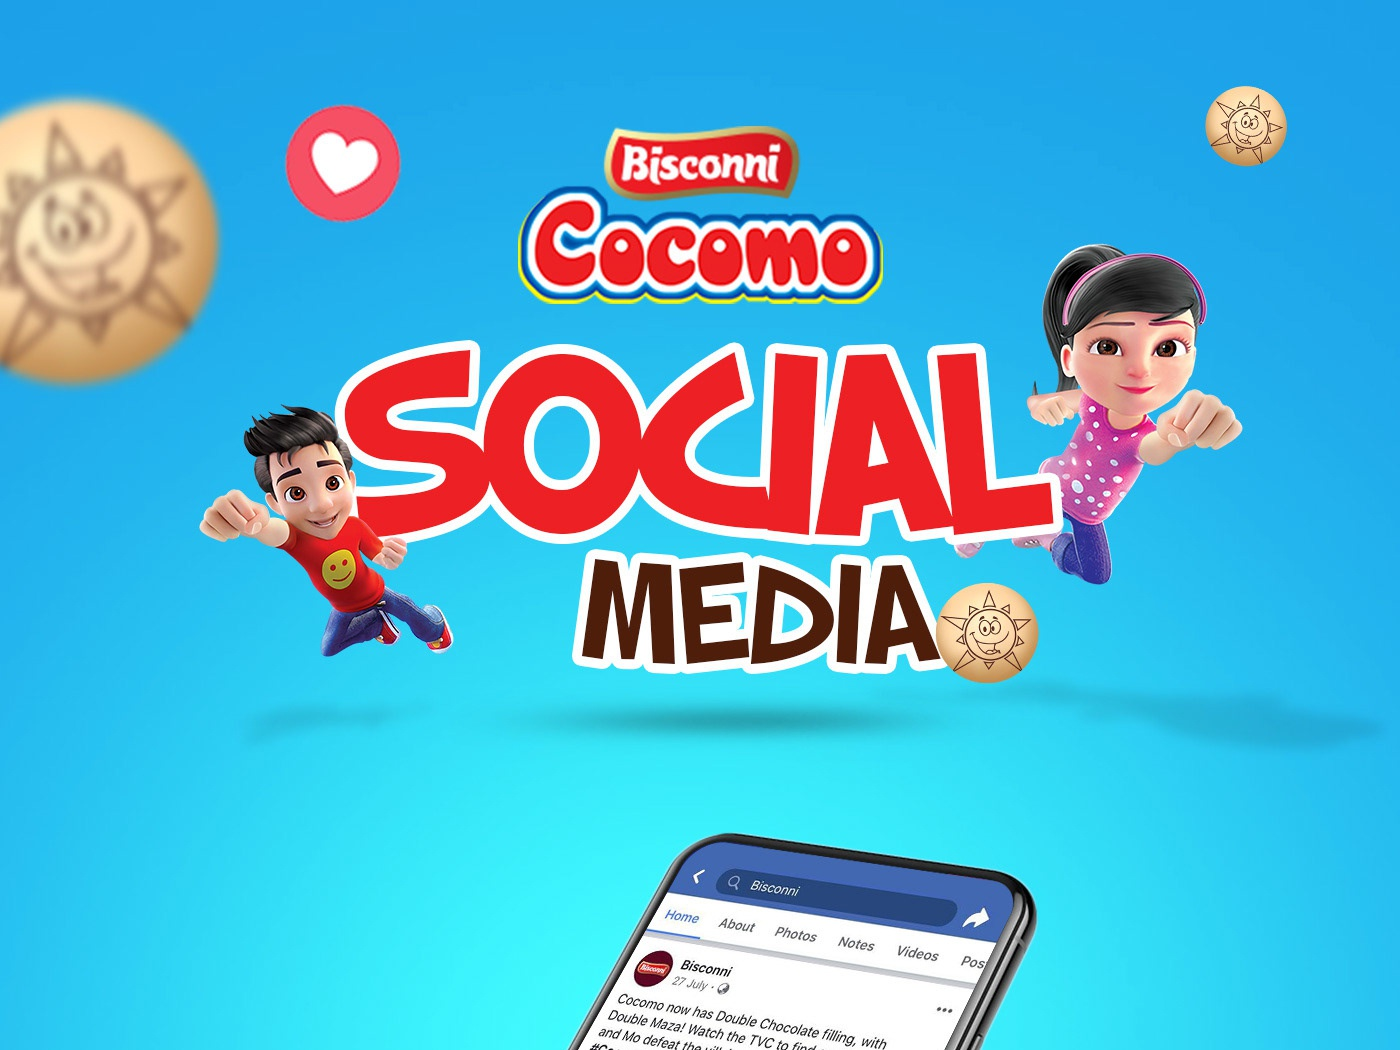 Bisconni Cocomo Social Media By Moiz Memon On Dribbble